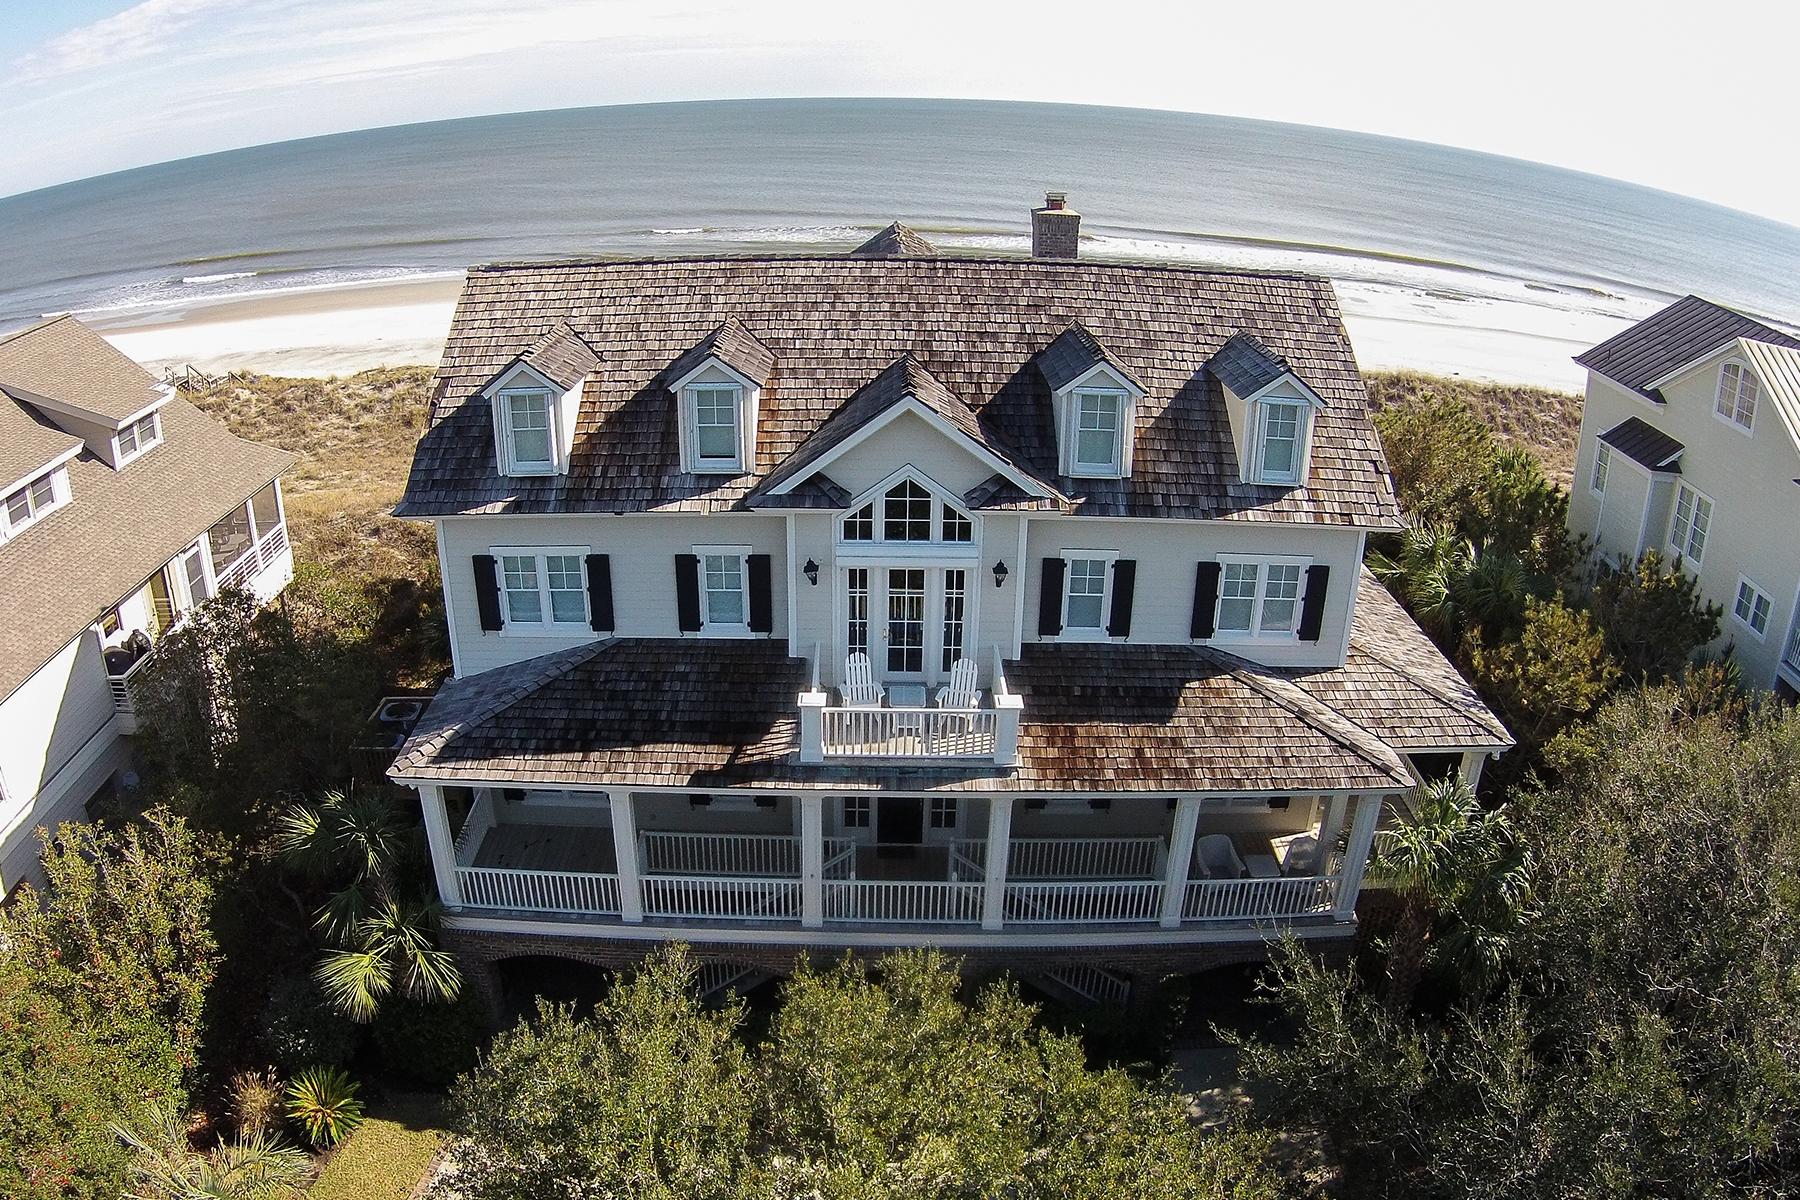 PG - Beach Brdg - drone 5 RS crop.jpg